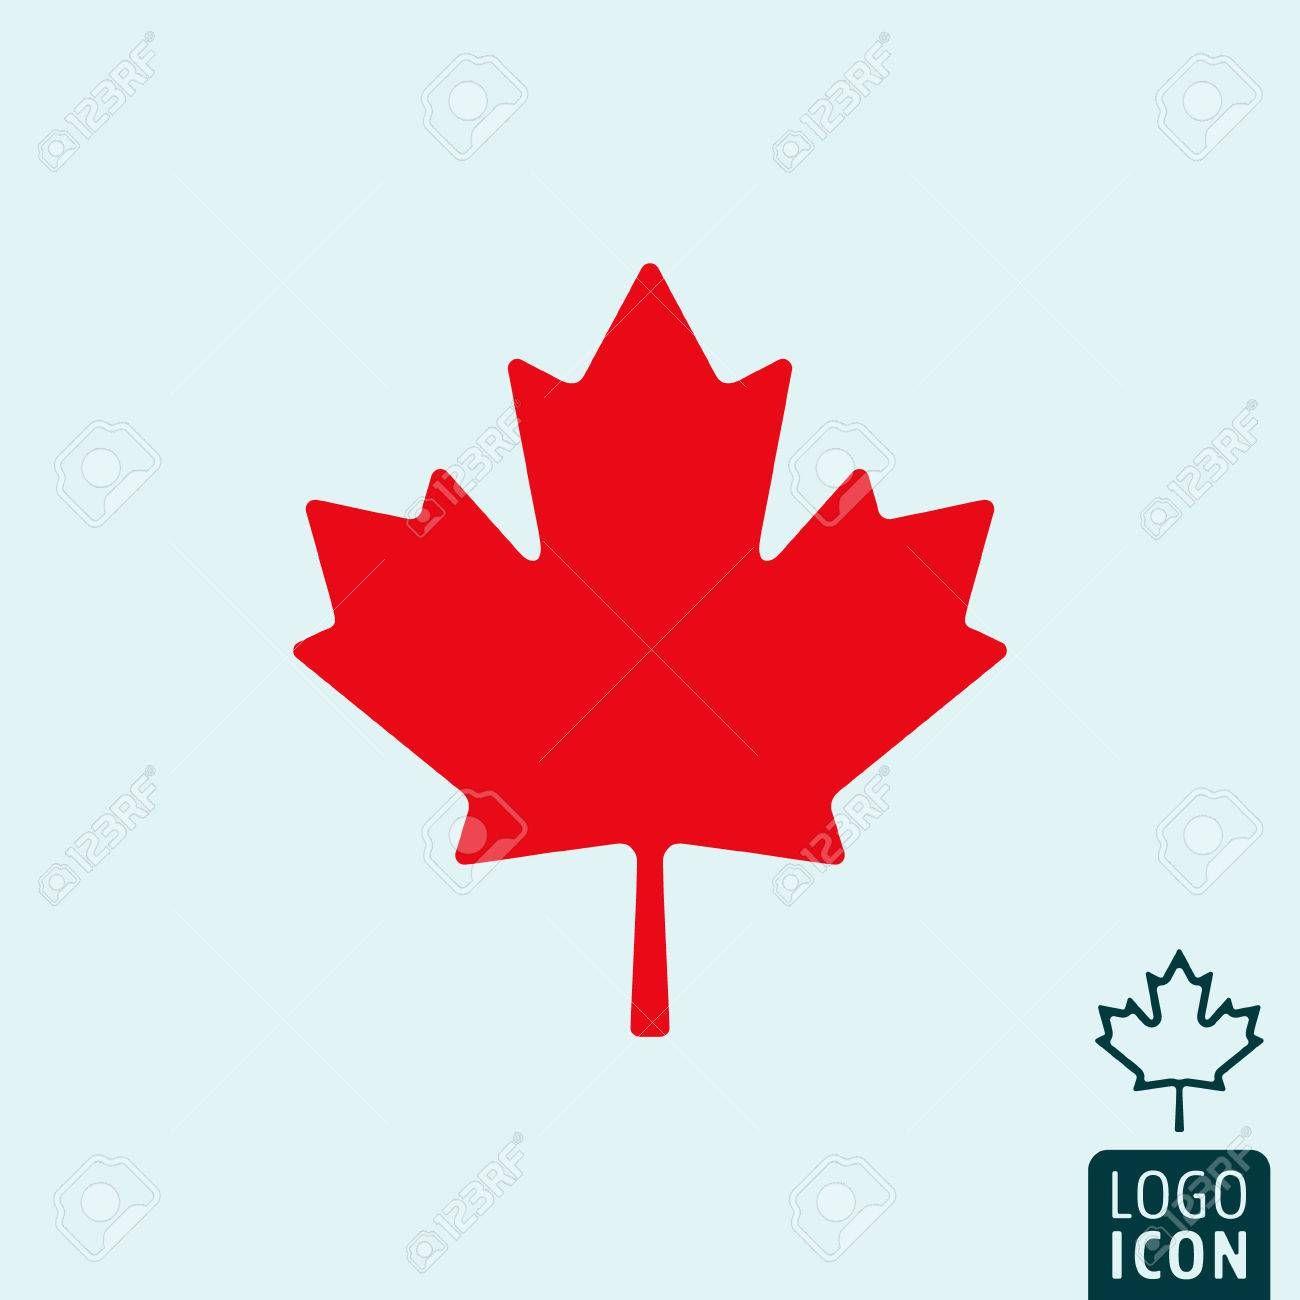 Canada Icon Canada Logo Canada Symbol Maple Leaf Icon Isolated Minimal Design Vector Illustration Affili Canada Logo Logo Design Typography Logo Design